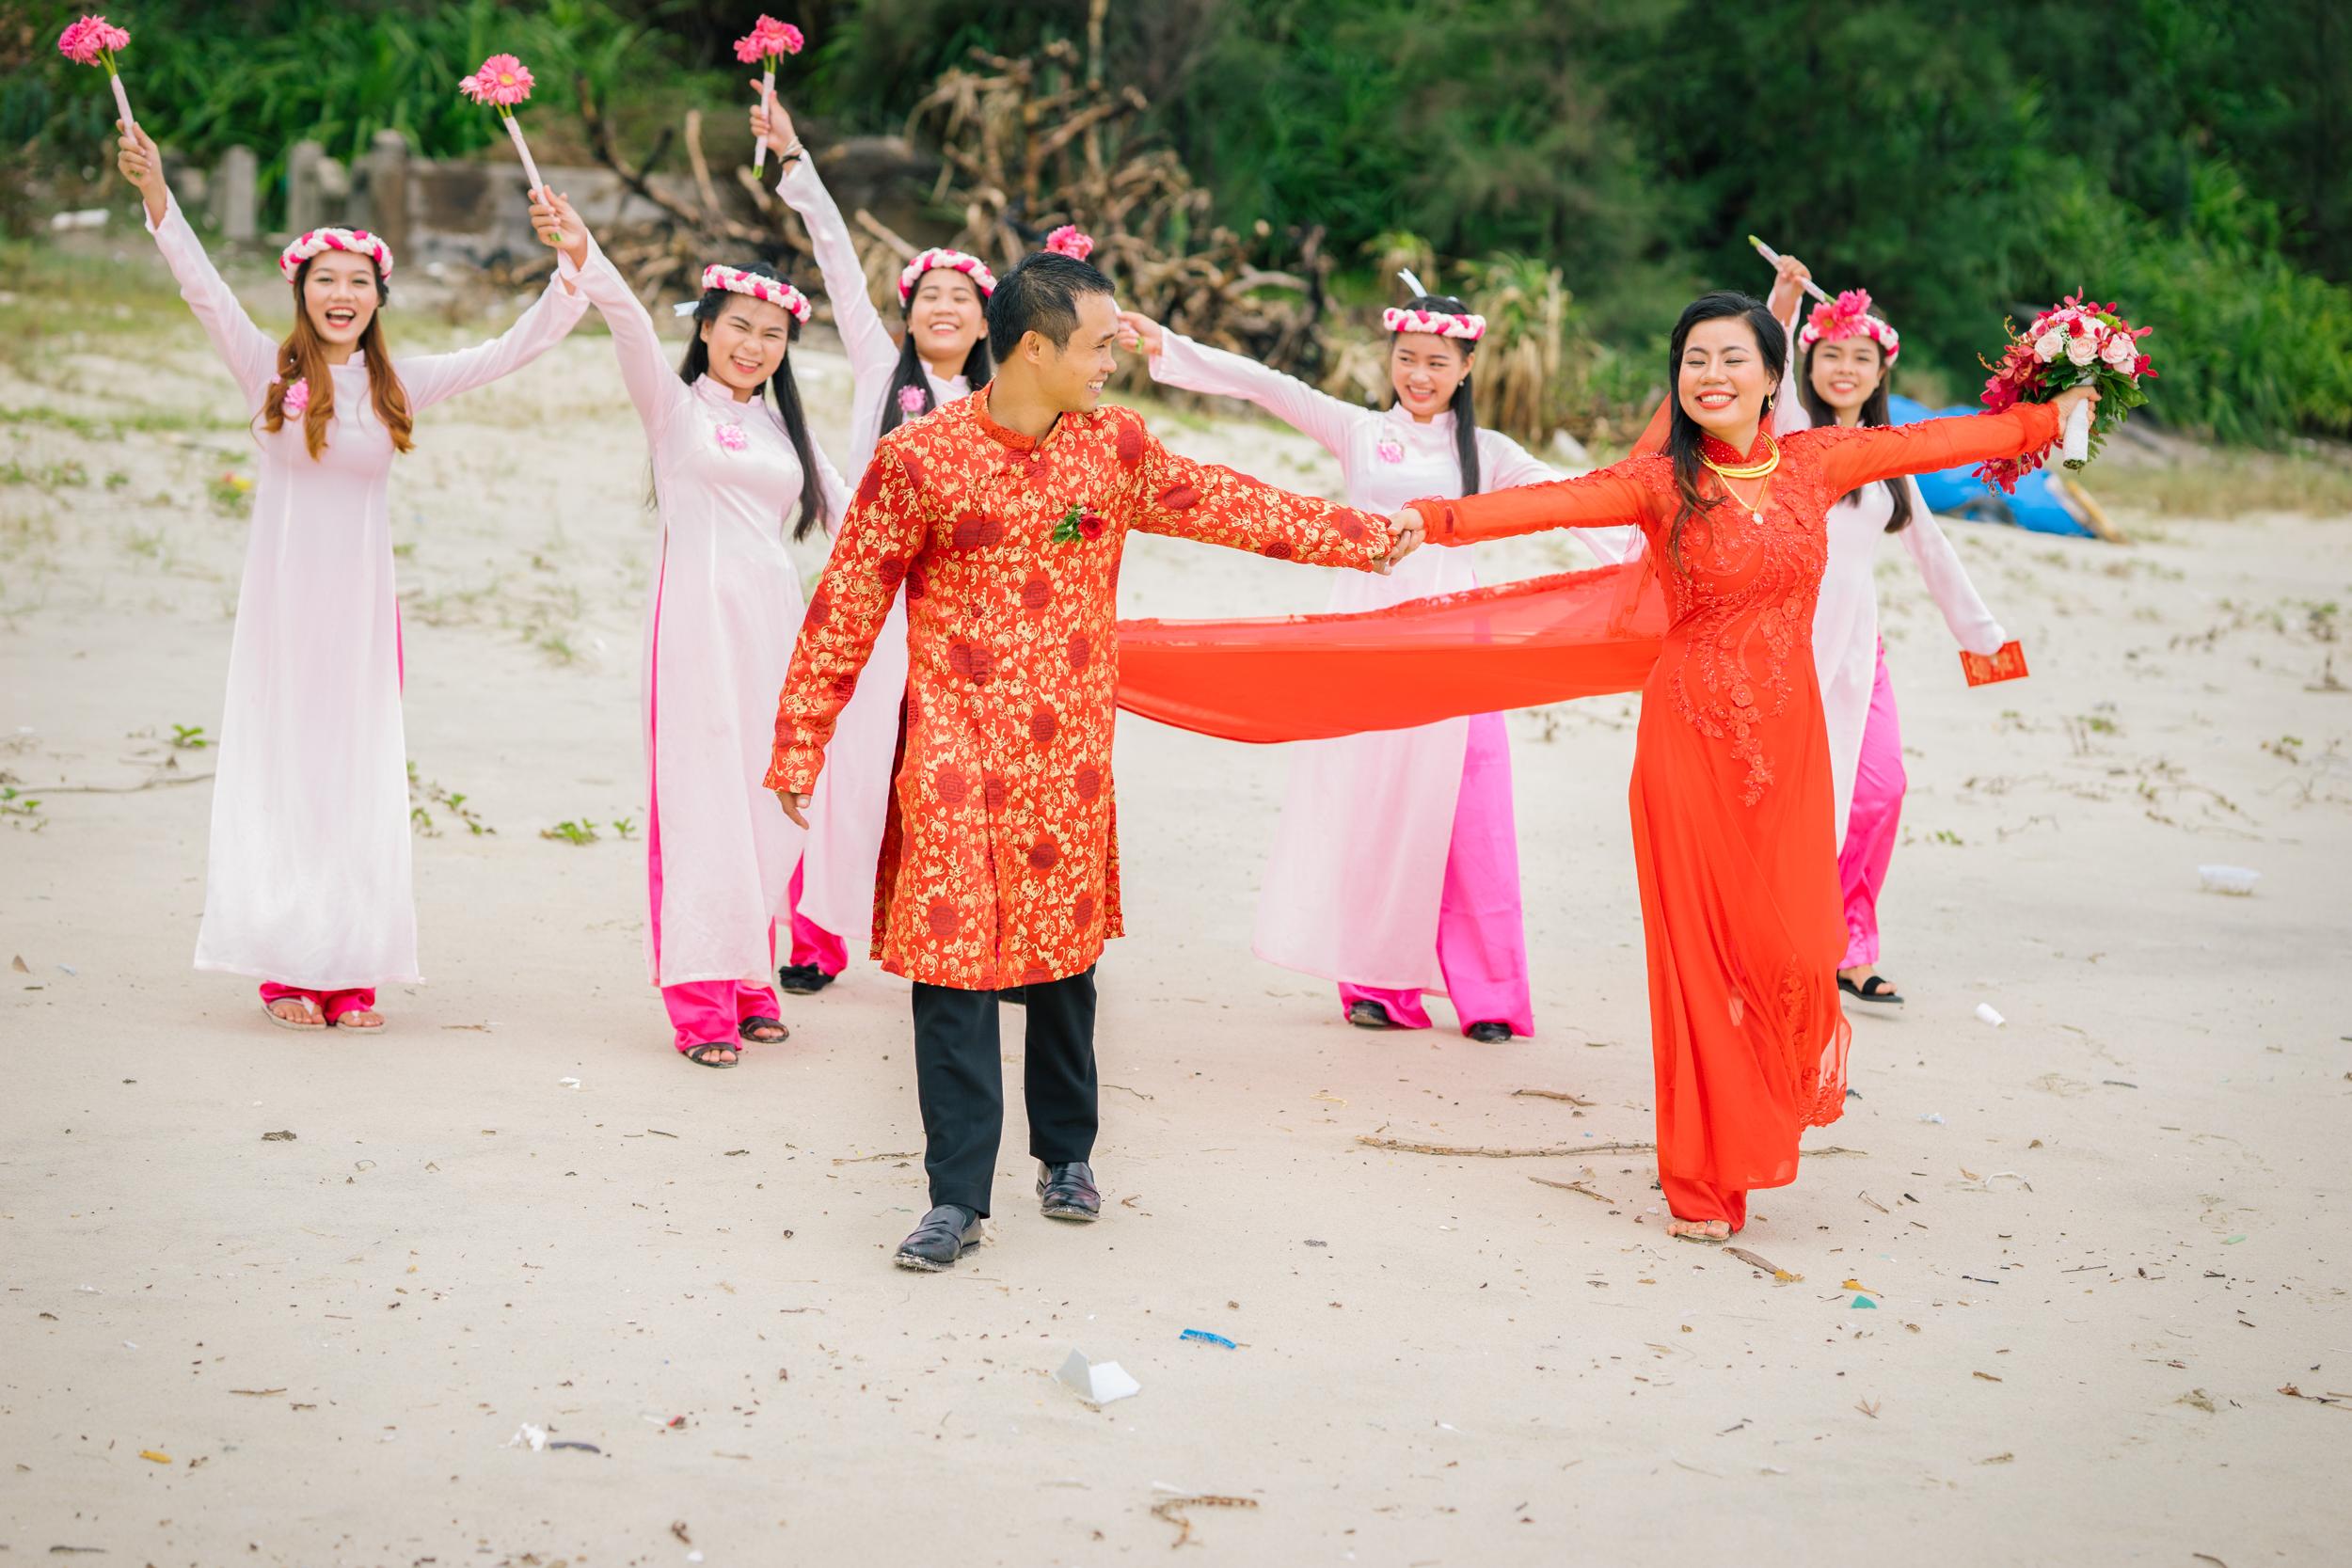 JKP-Destination-Weddings-0061.JPG